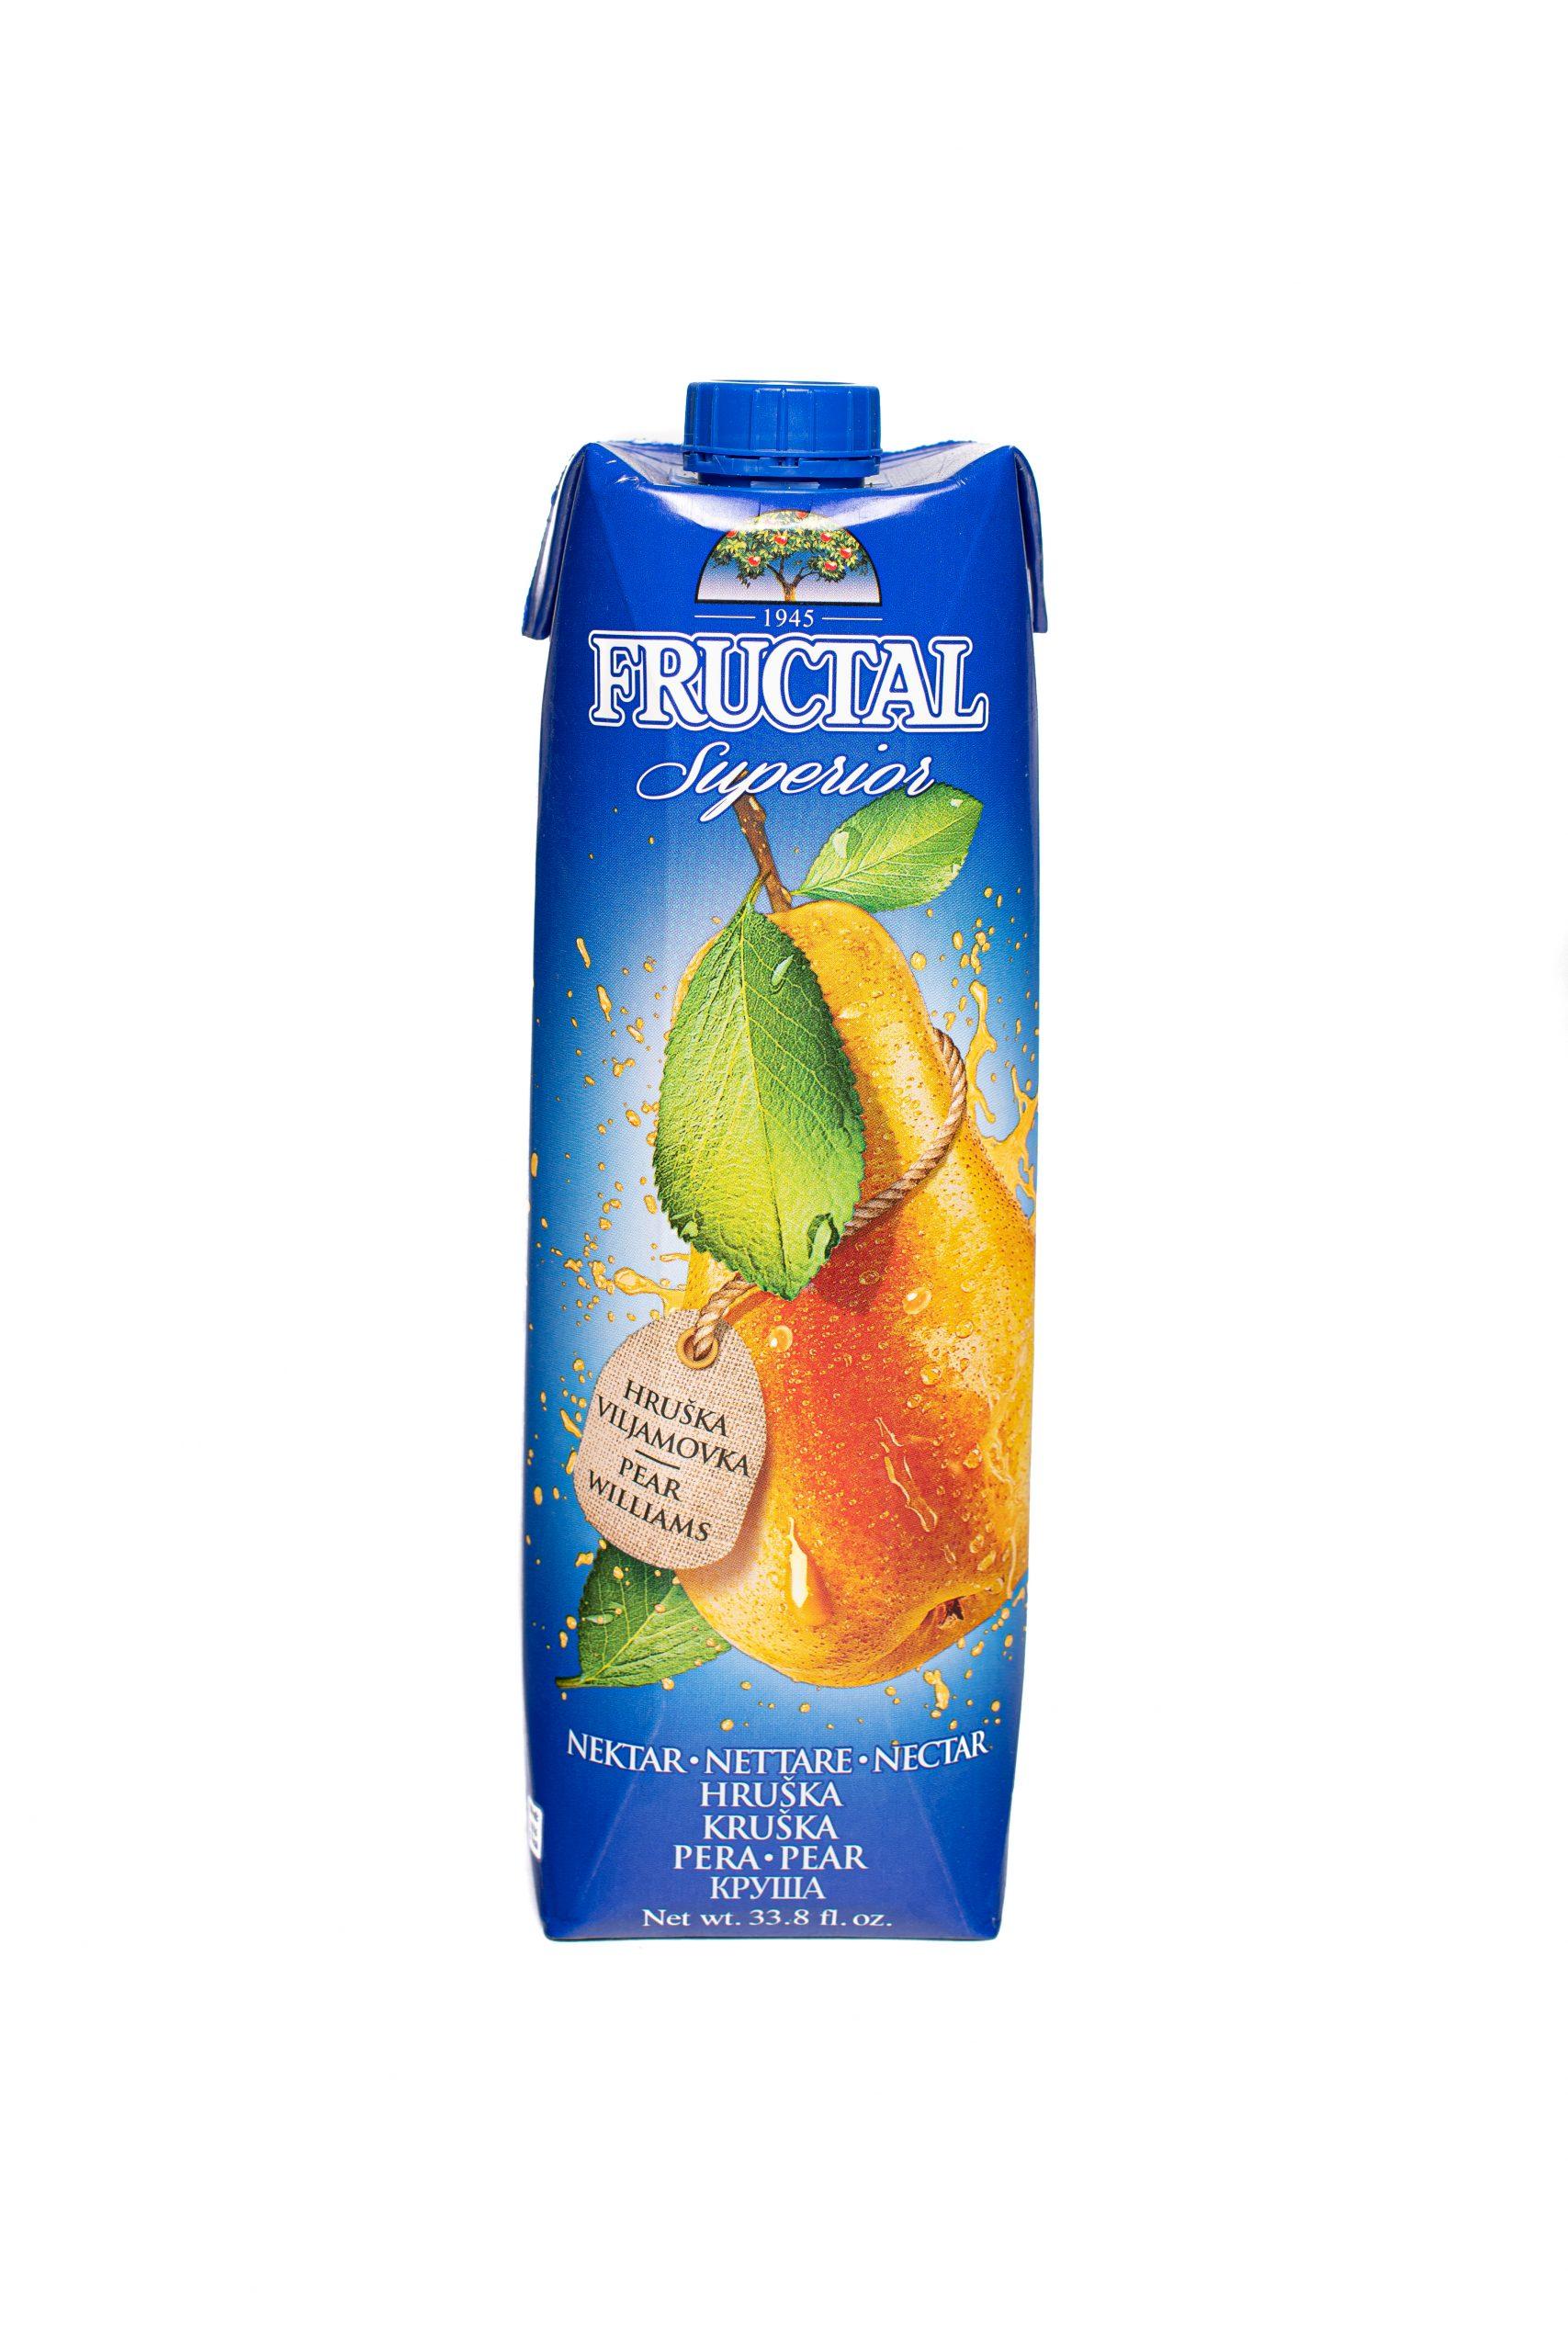 Fructal Superior | 1L | Pear